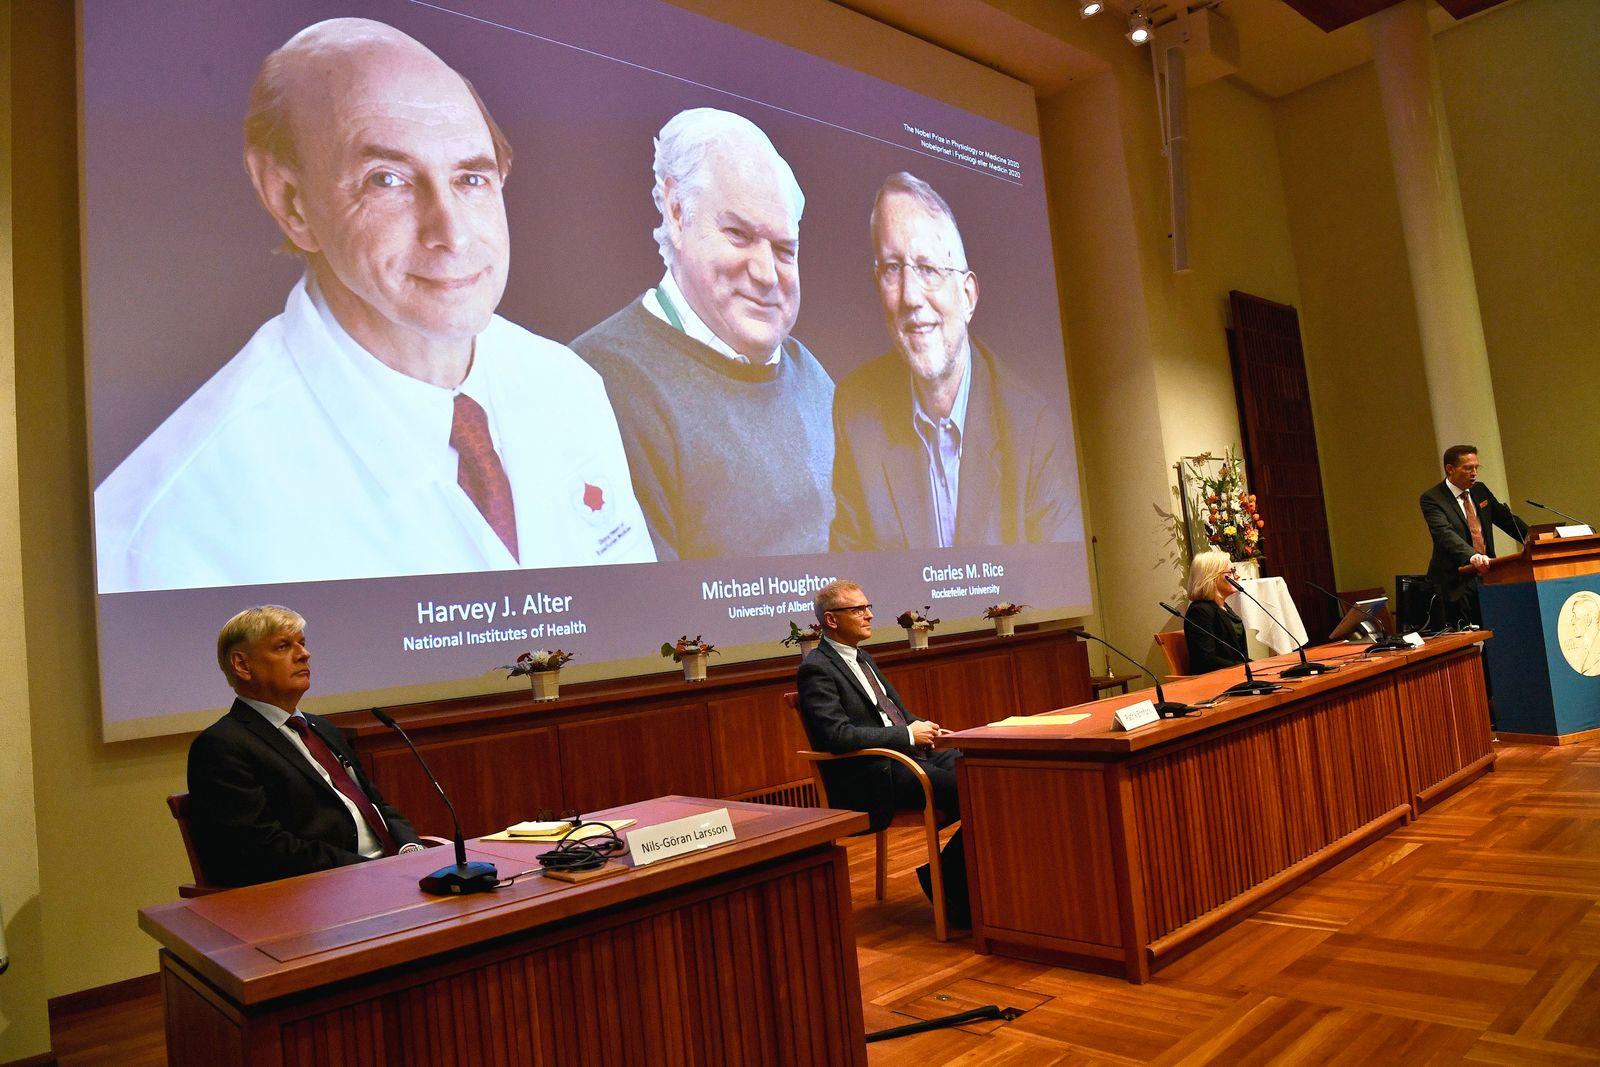 Medizin-Nobelpreis an Entdecker von Hepatitis-C-Virus